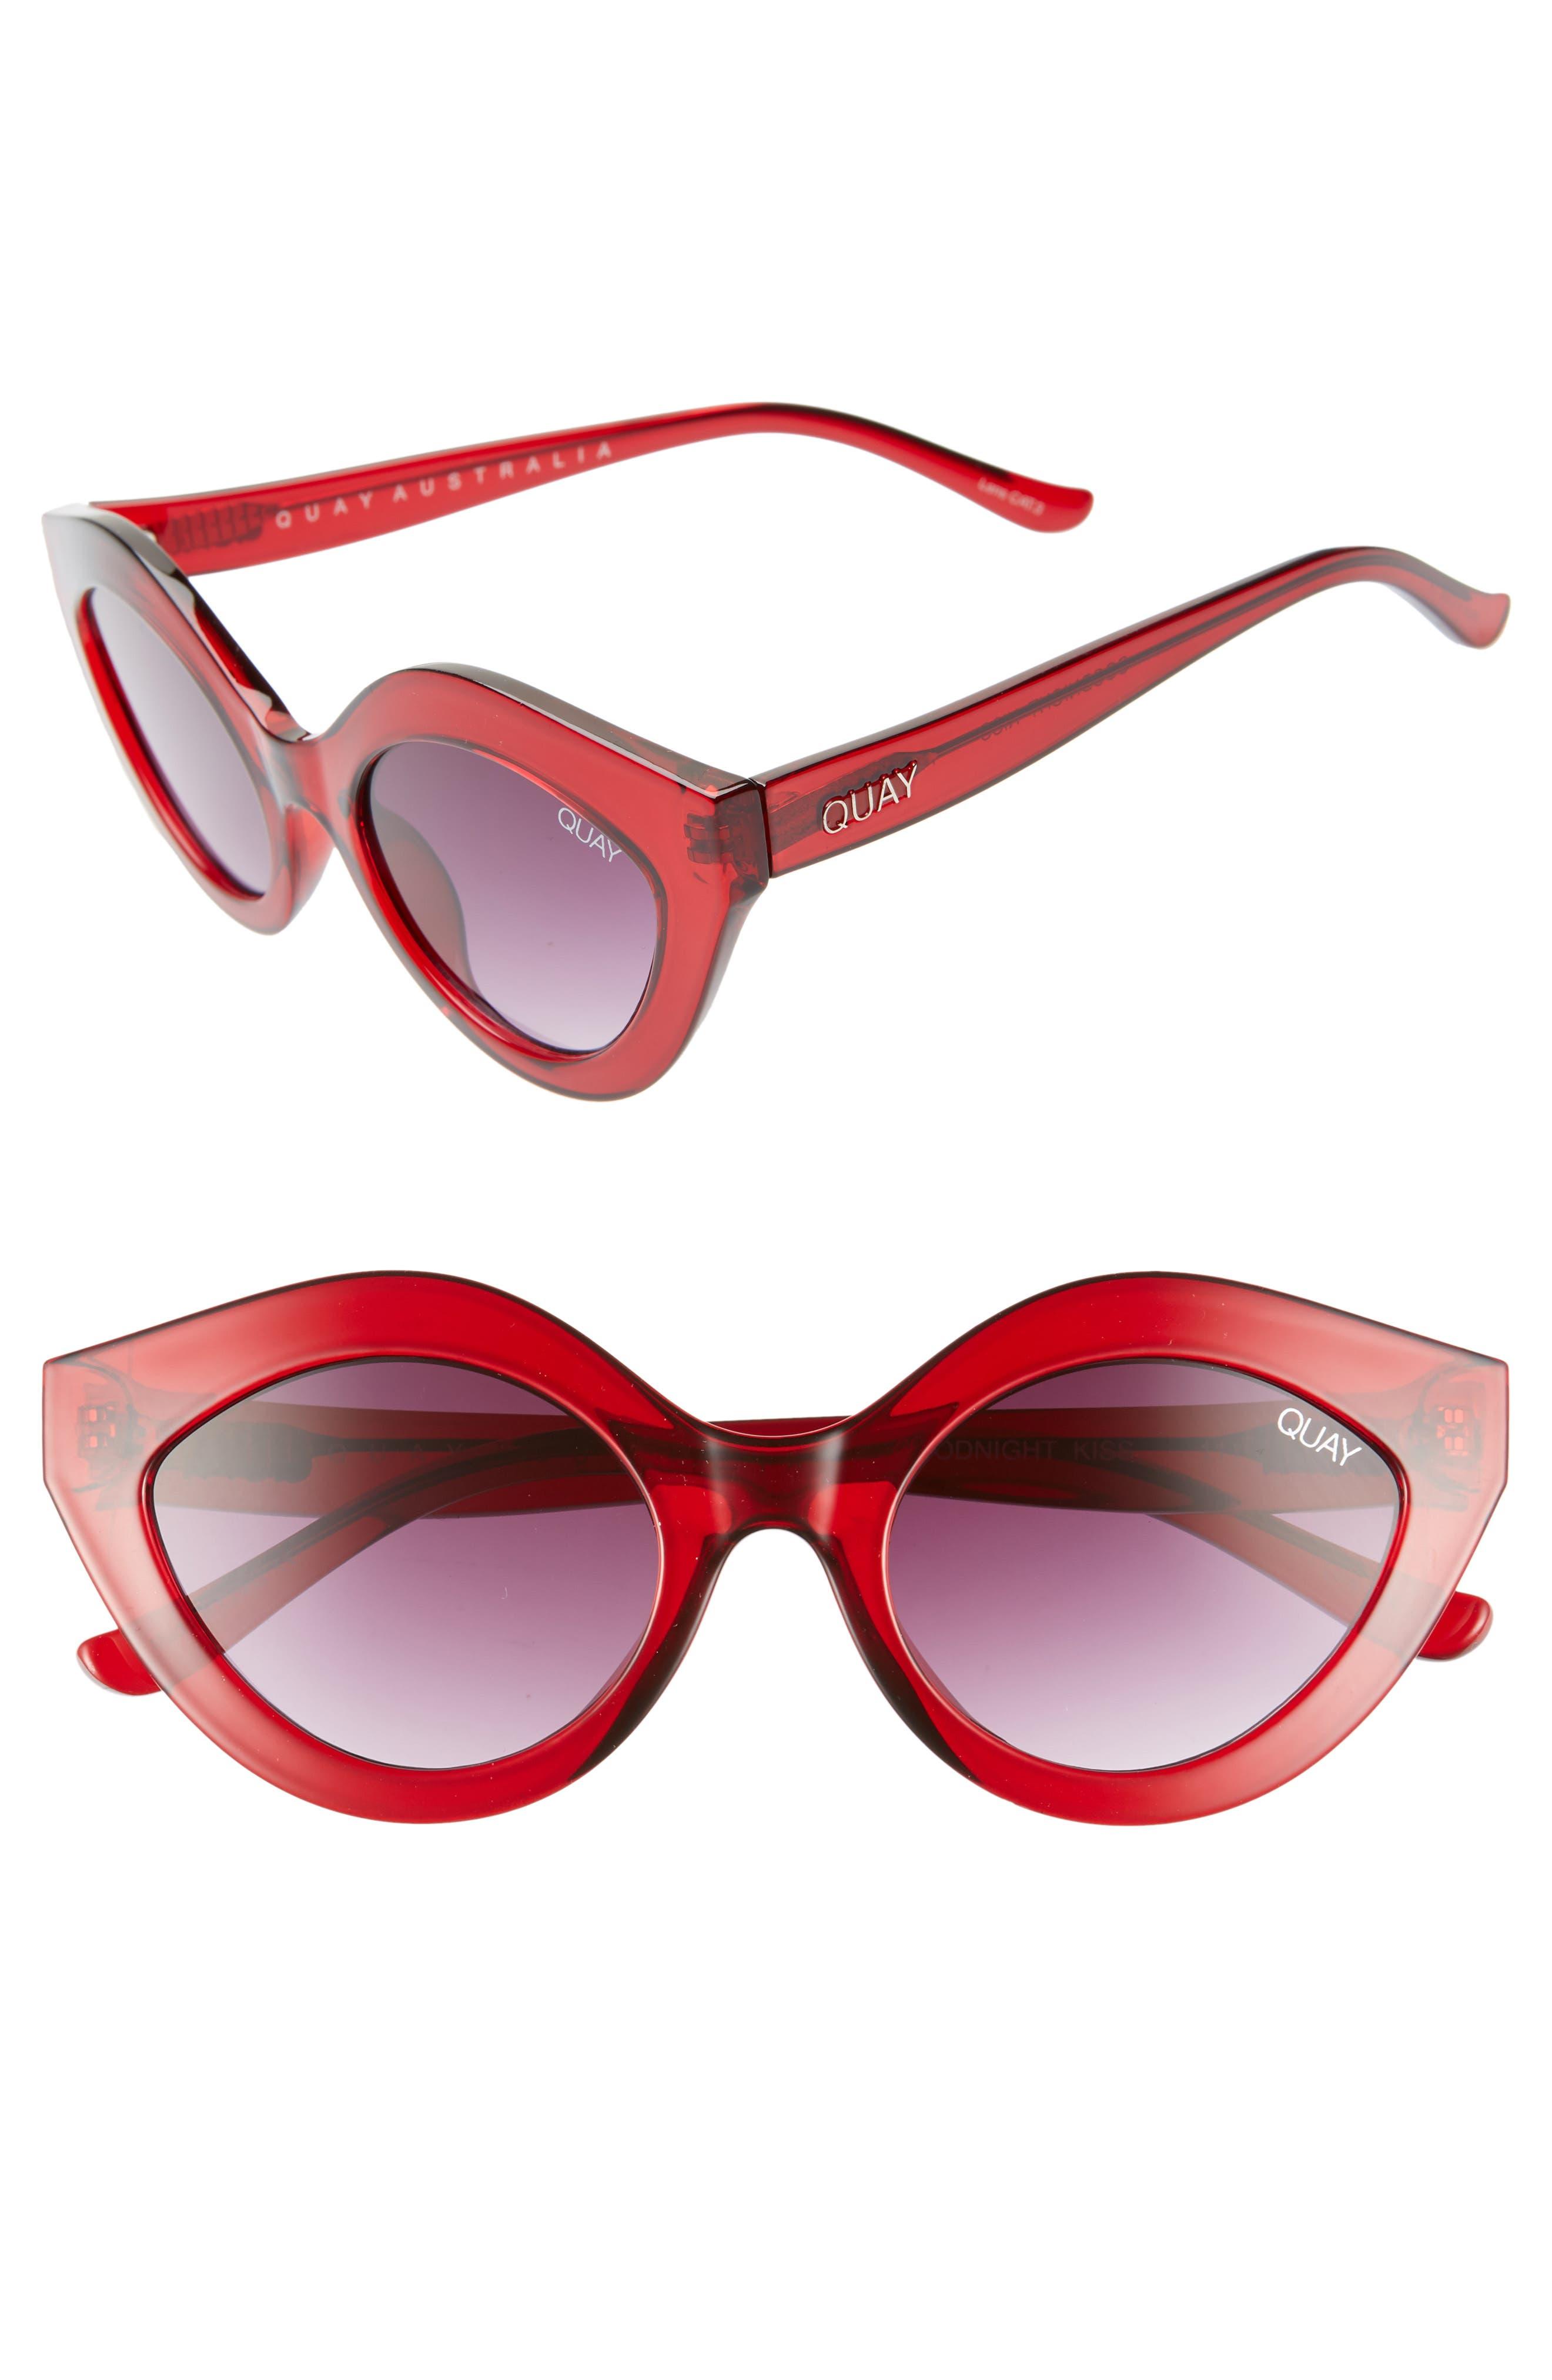 Quay Australia Goodnight Kiss Cat Eye Sunglasses - Red / Purple Fade